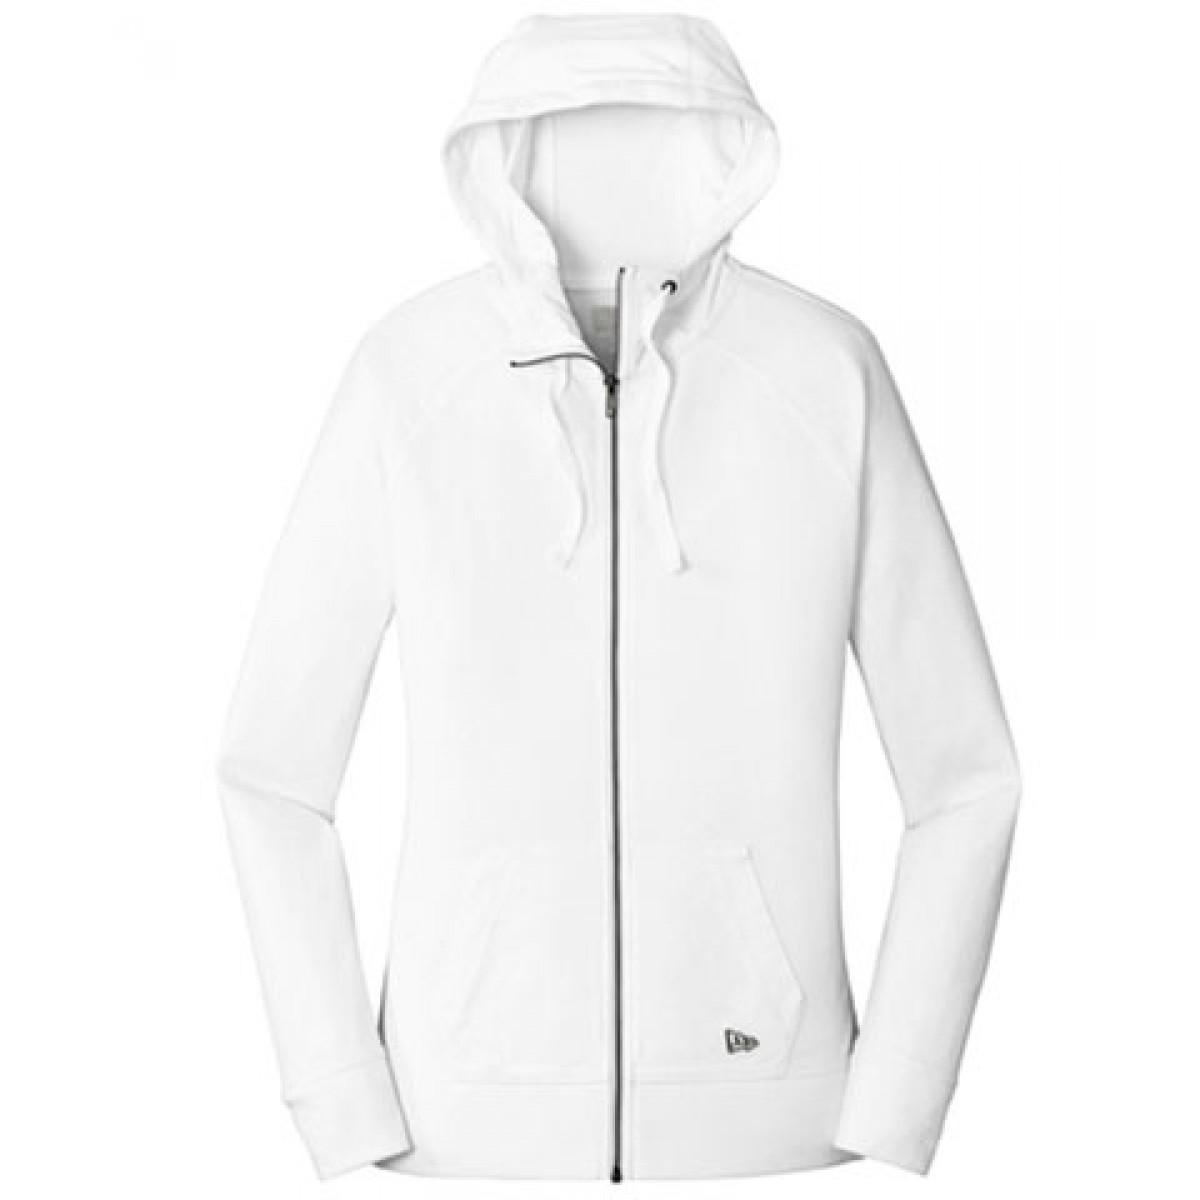 Ladies Full Zip Hoody / White